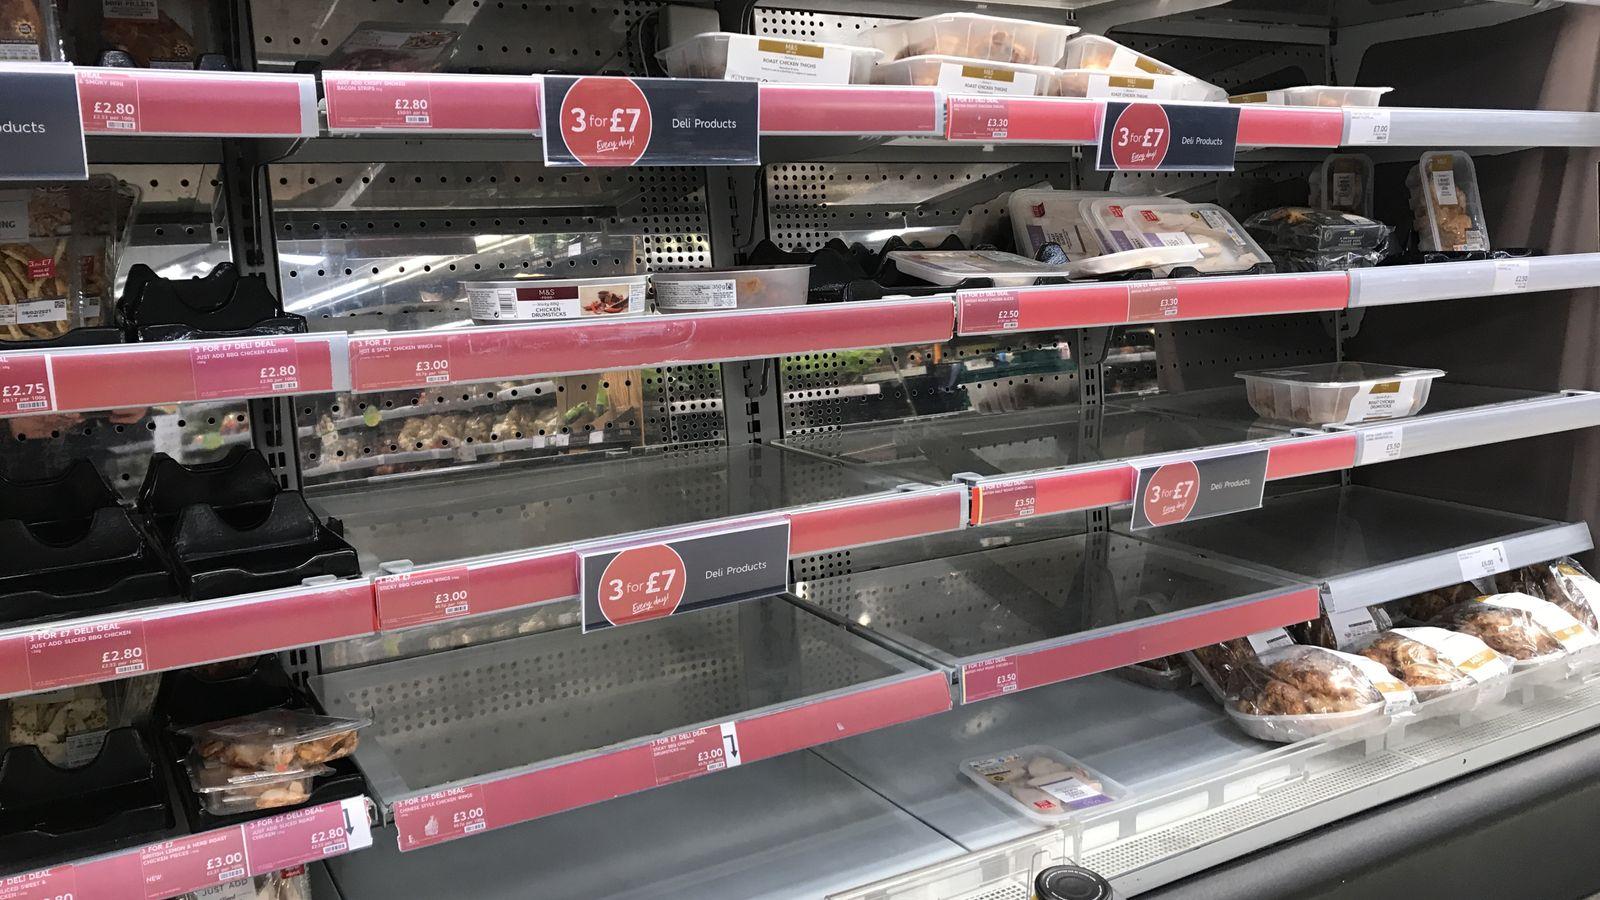 COVID-19: 'Increasing pressure' to keep shelves stocked as 'pingdemic' threatens staffing, retailers warn